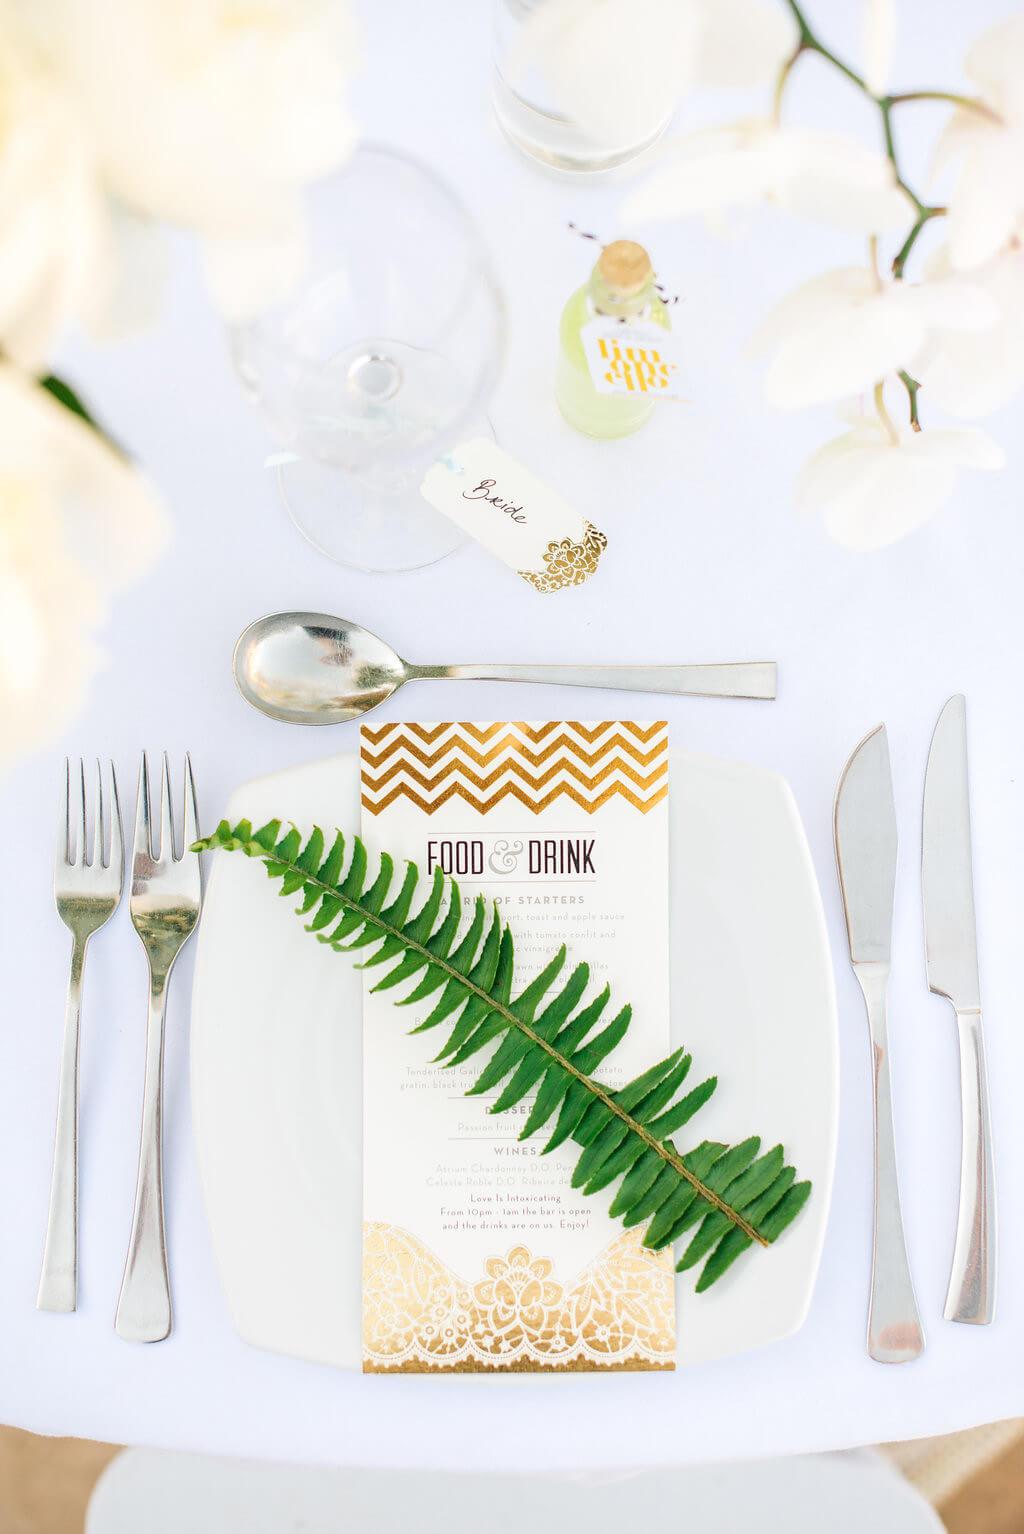 https://www.white-ibiza.com/wp-content/uploads/2020/03/ibiza-wedding-venues-amante-ibiza-2020-12.jpg